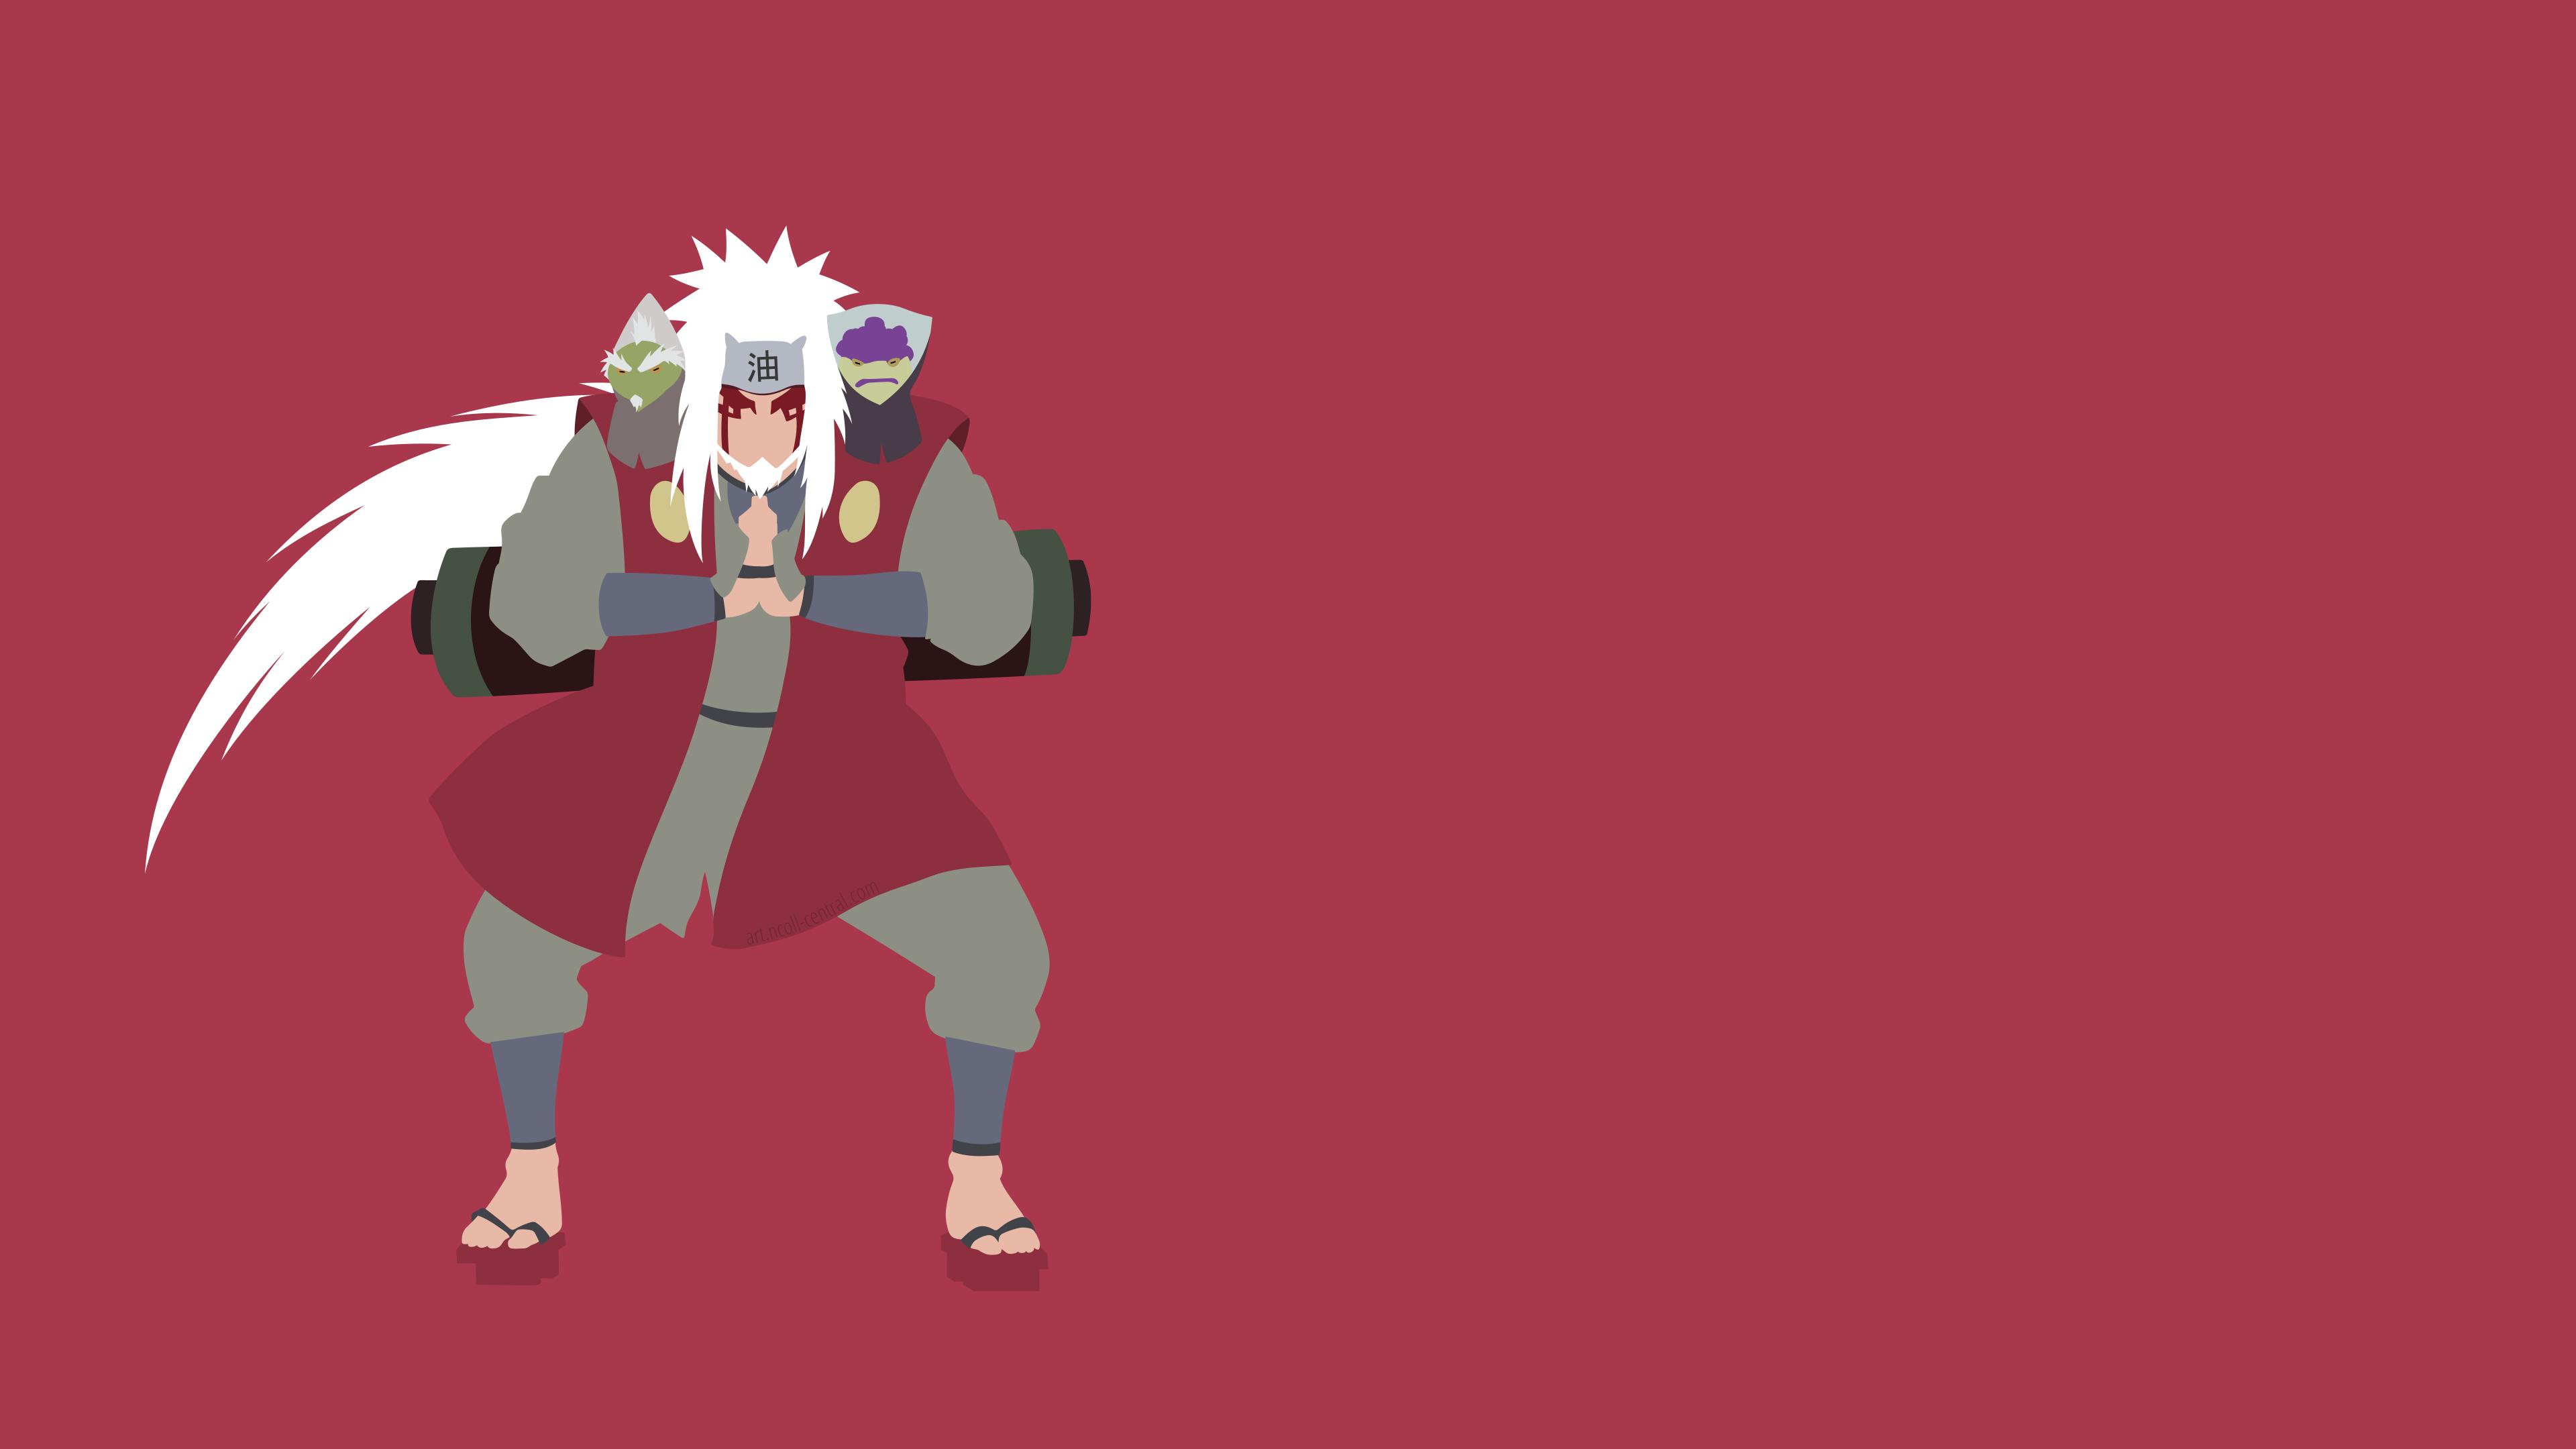 Naruto Jiraiya Minimalist Wallpaper